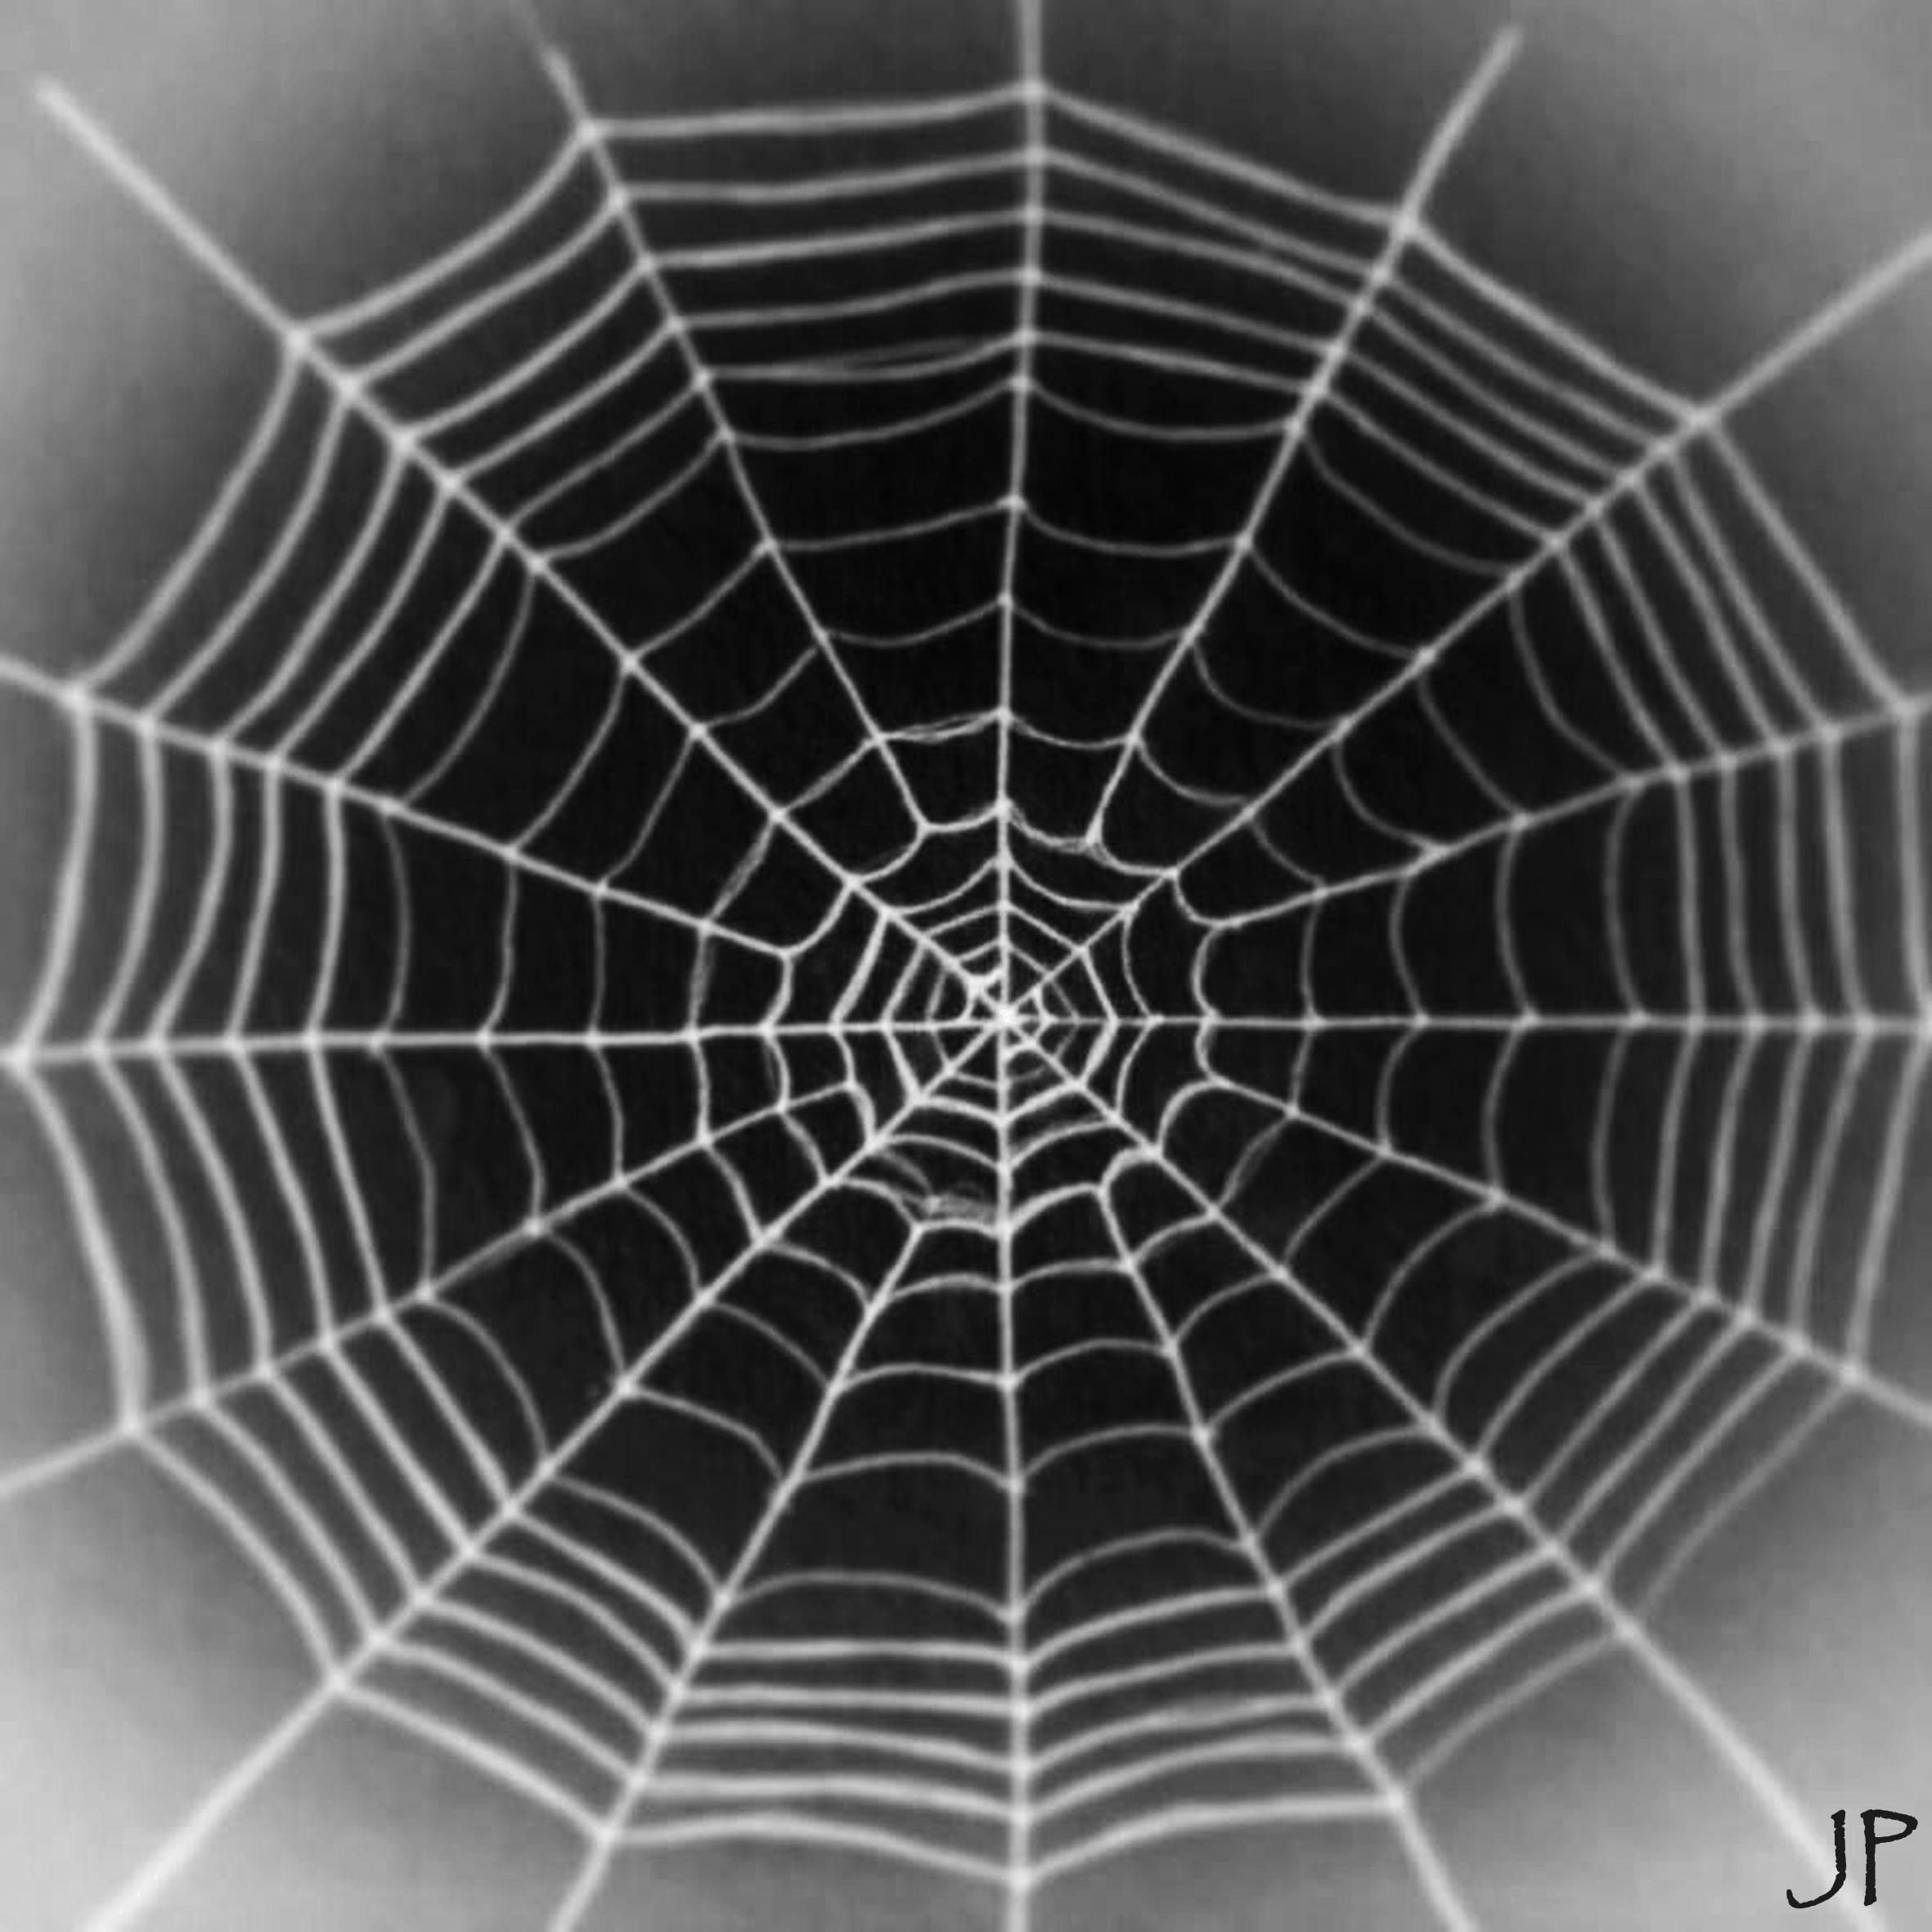 Spider Web Halloween Decorations: BWScience